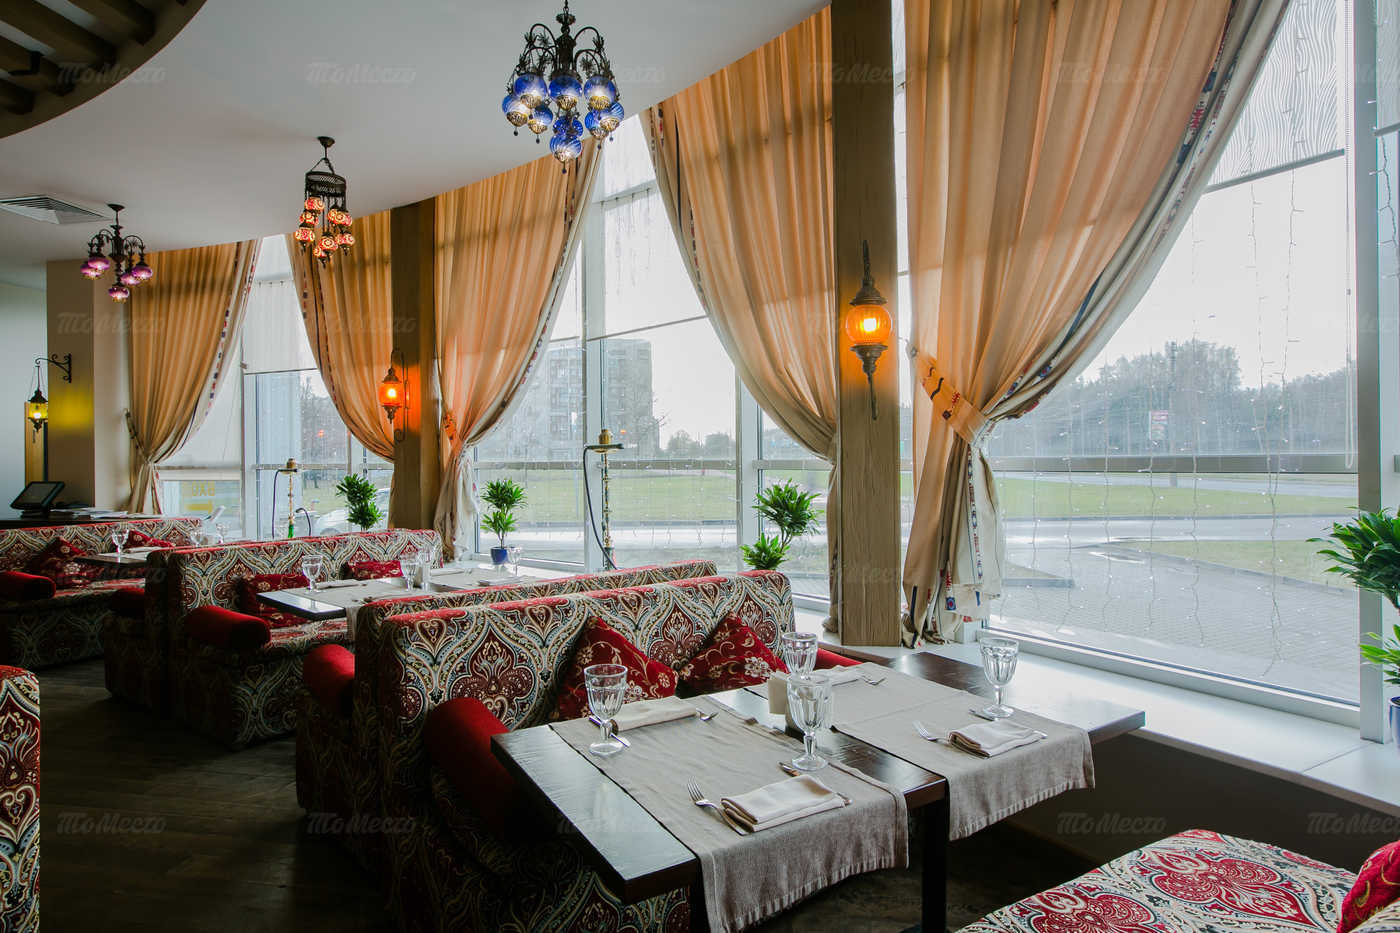 Меню ресторана Афиет (Afiyet) на Тихорецком проспекте